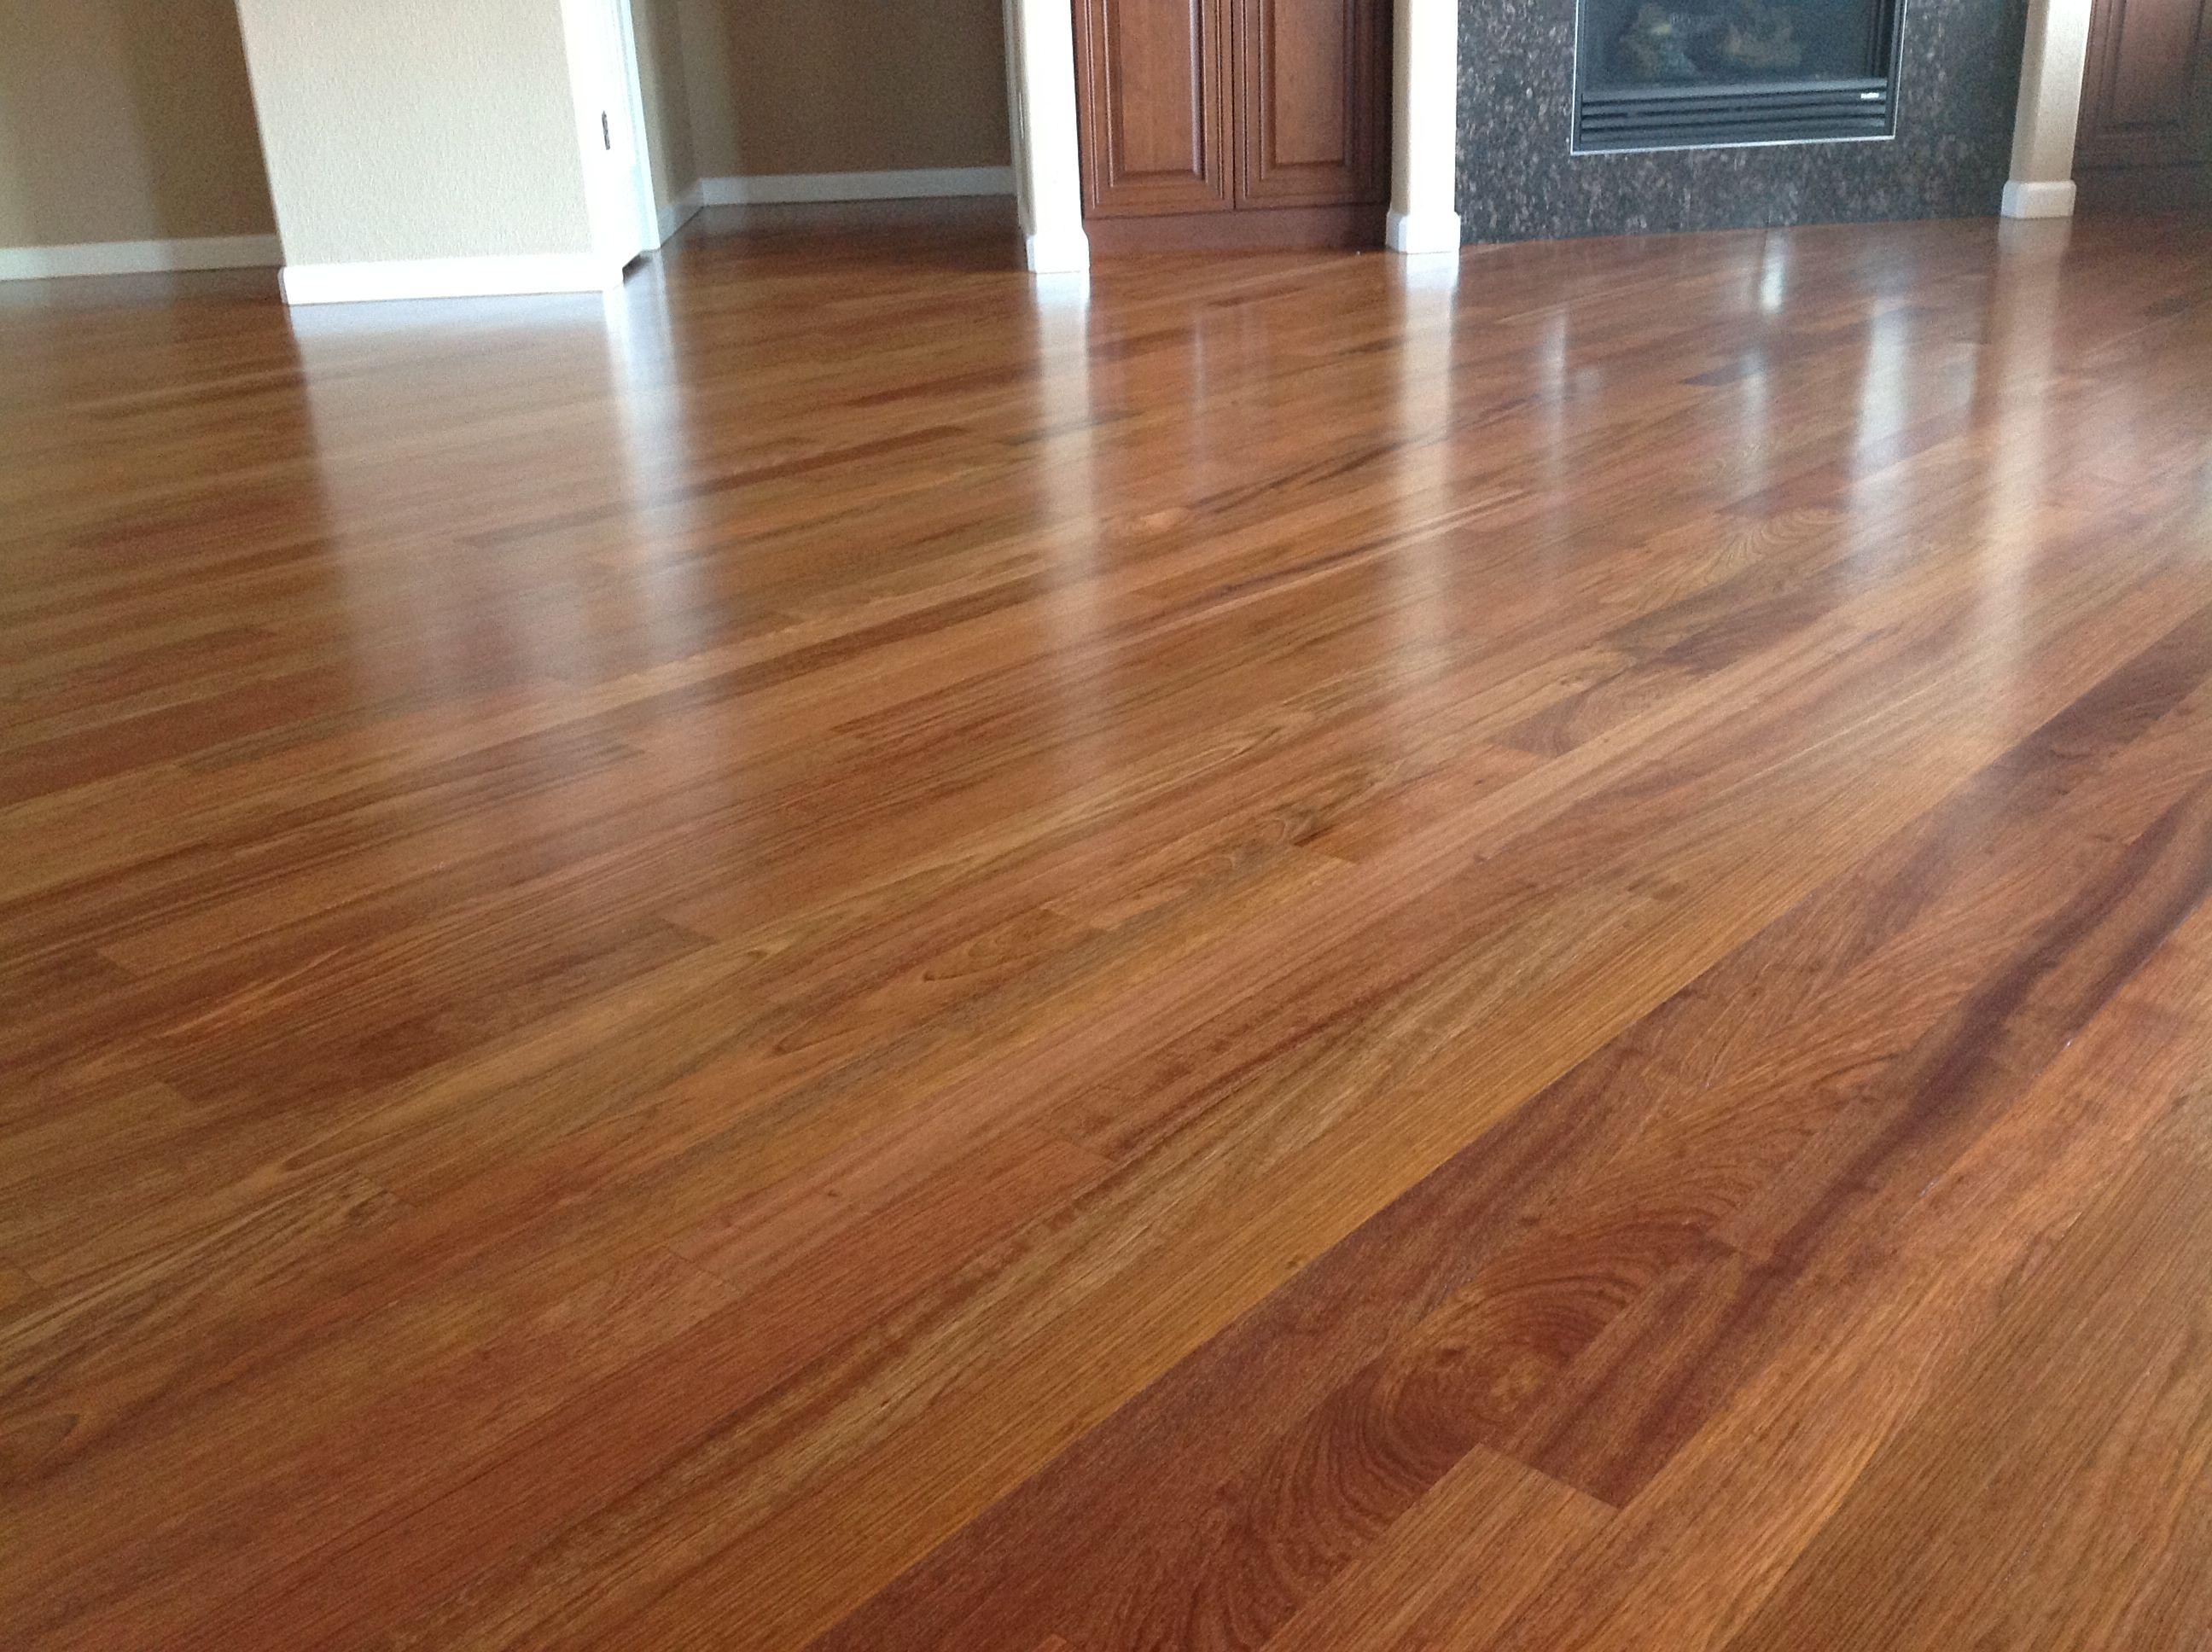 American cherry wood flooring refinishing floors